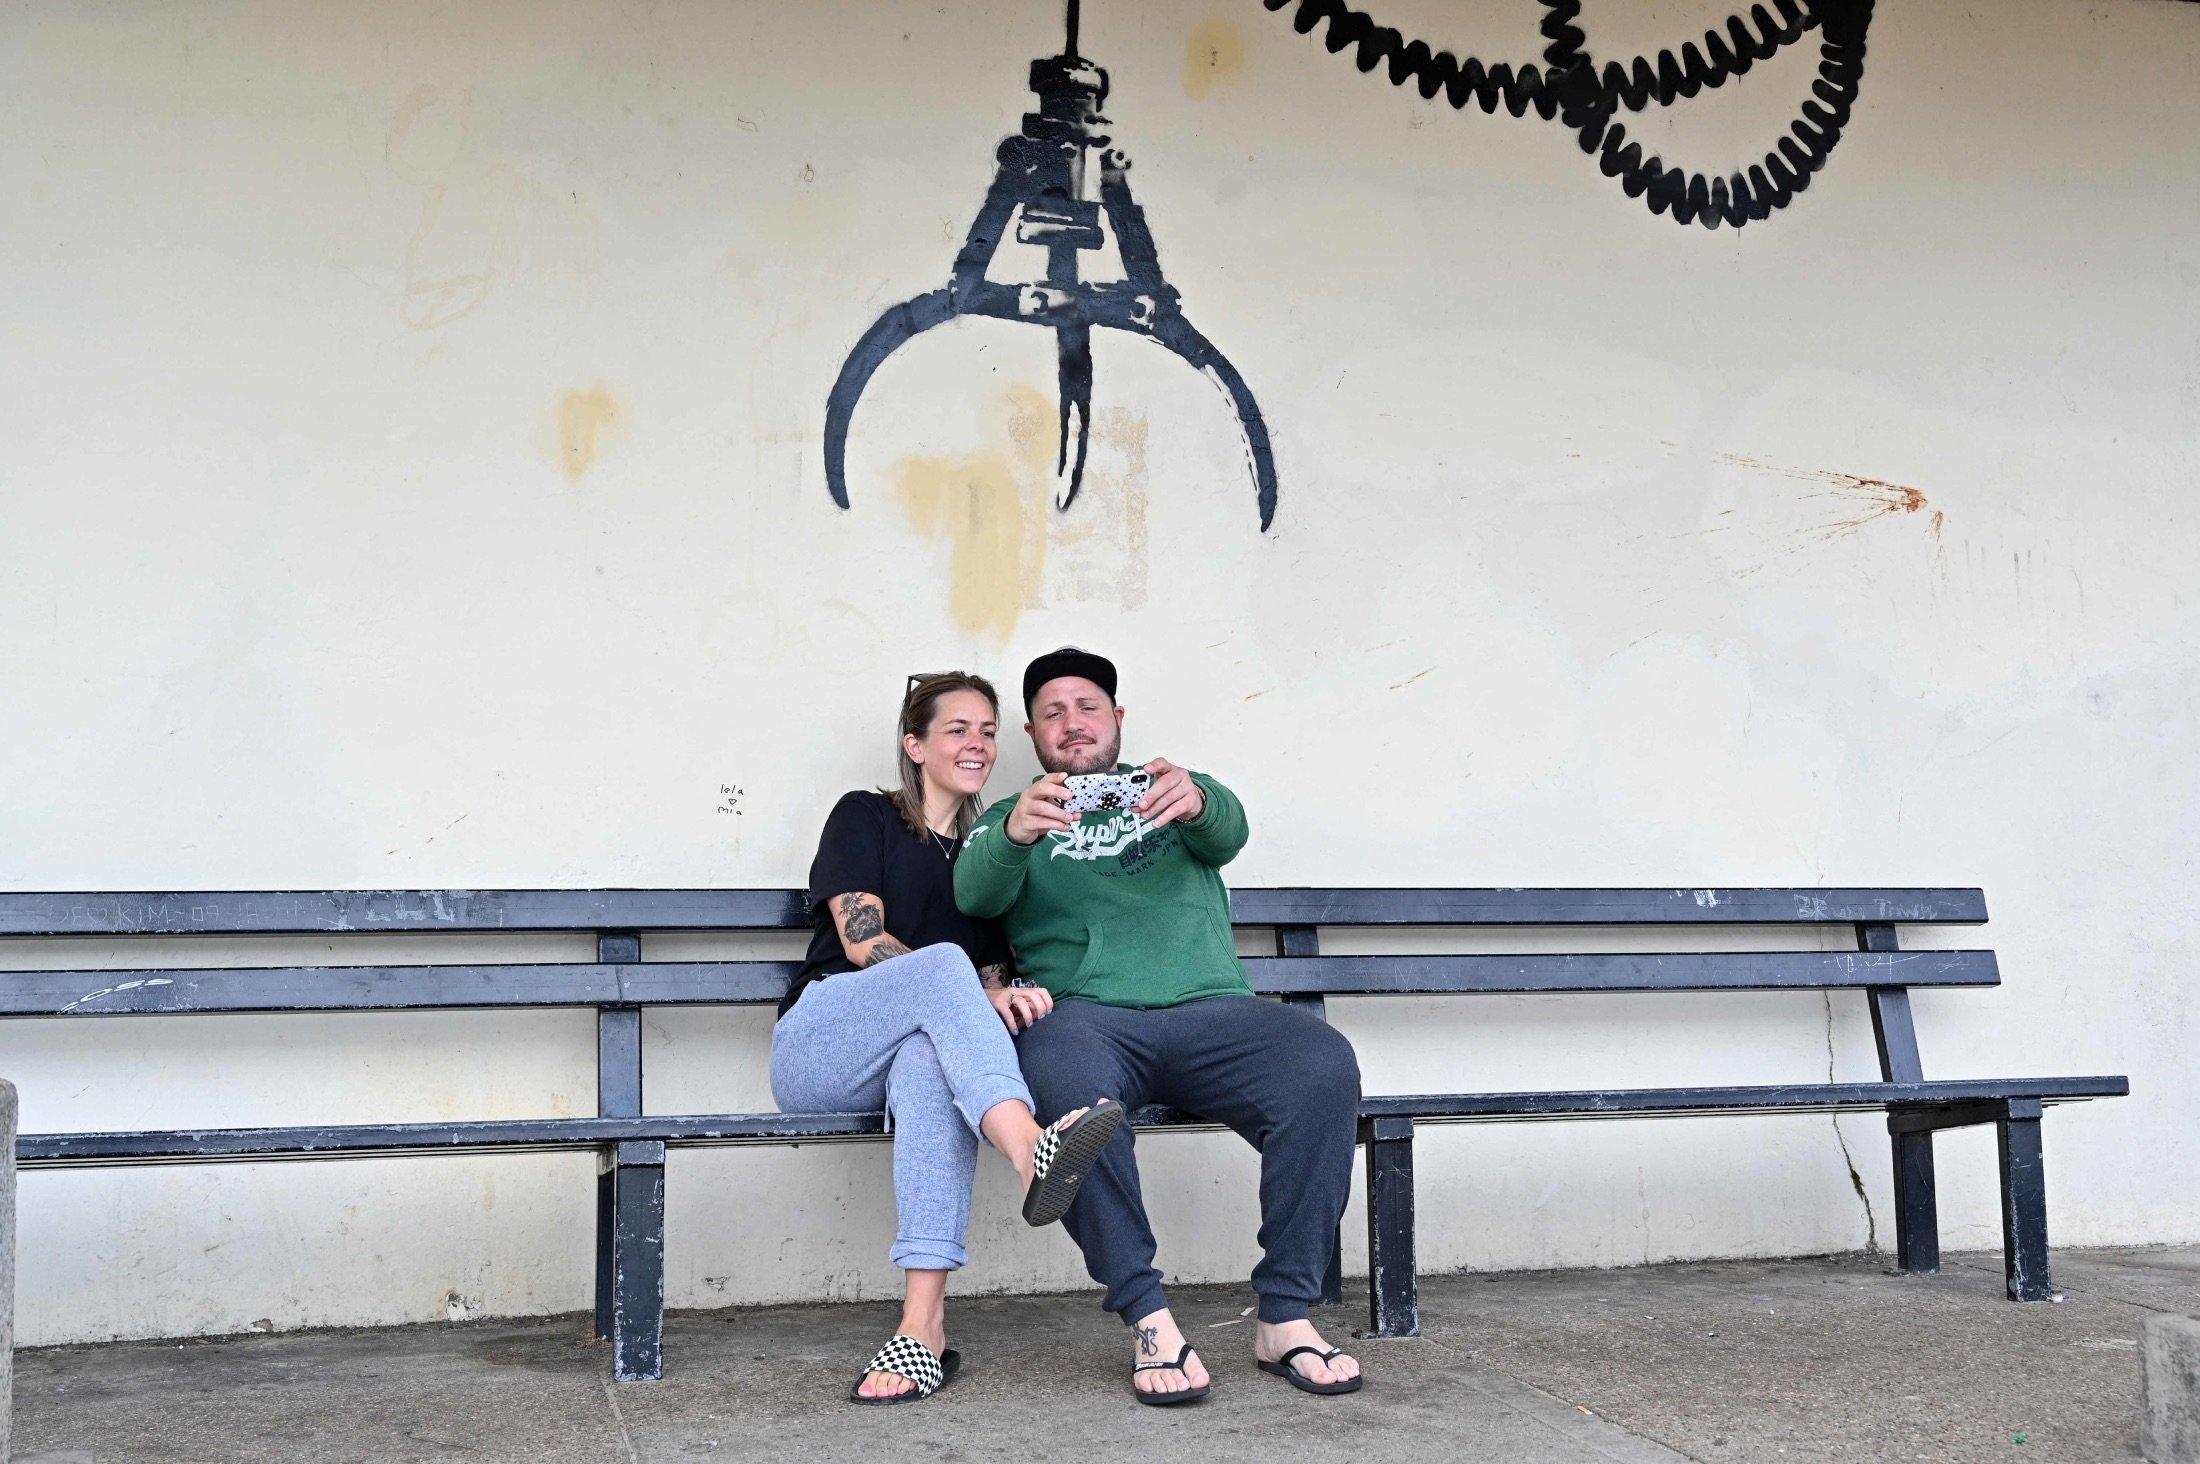 A couple take a selfie photograph below a graffiti artwork of an amusement arcade grabber, which bears the hallmarks of street artist Banksy, on a wall in Gorleston-on-Sea, U.K., Aug. 8, 2021. (AFP Photo)